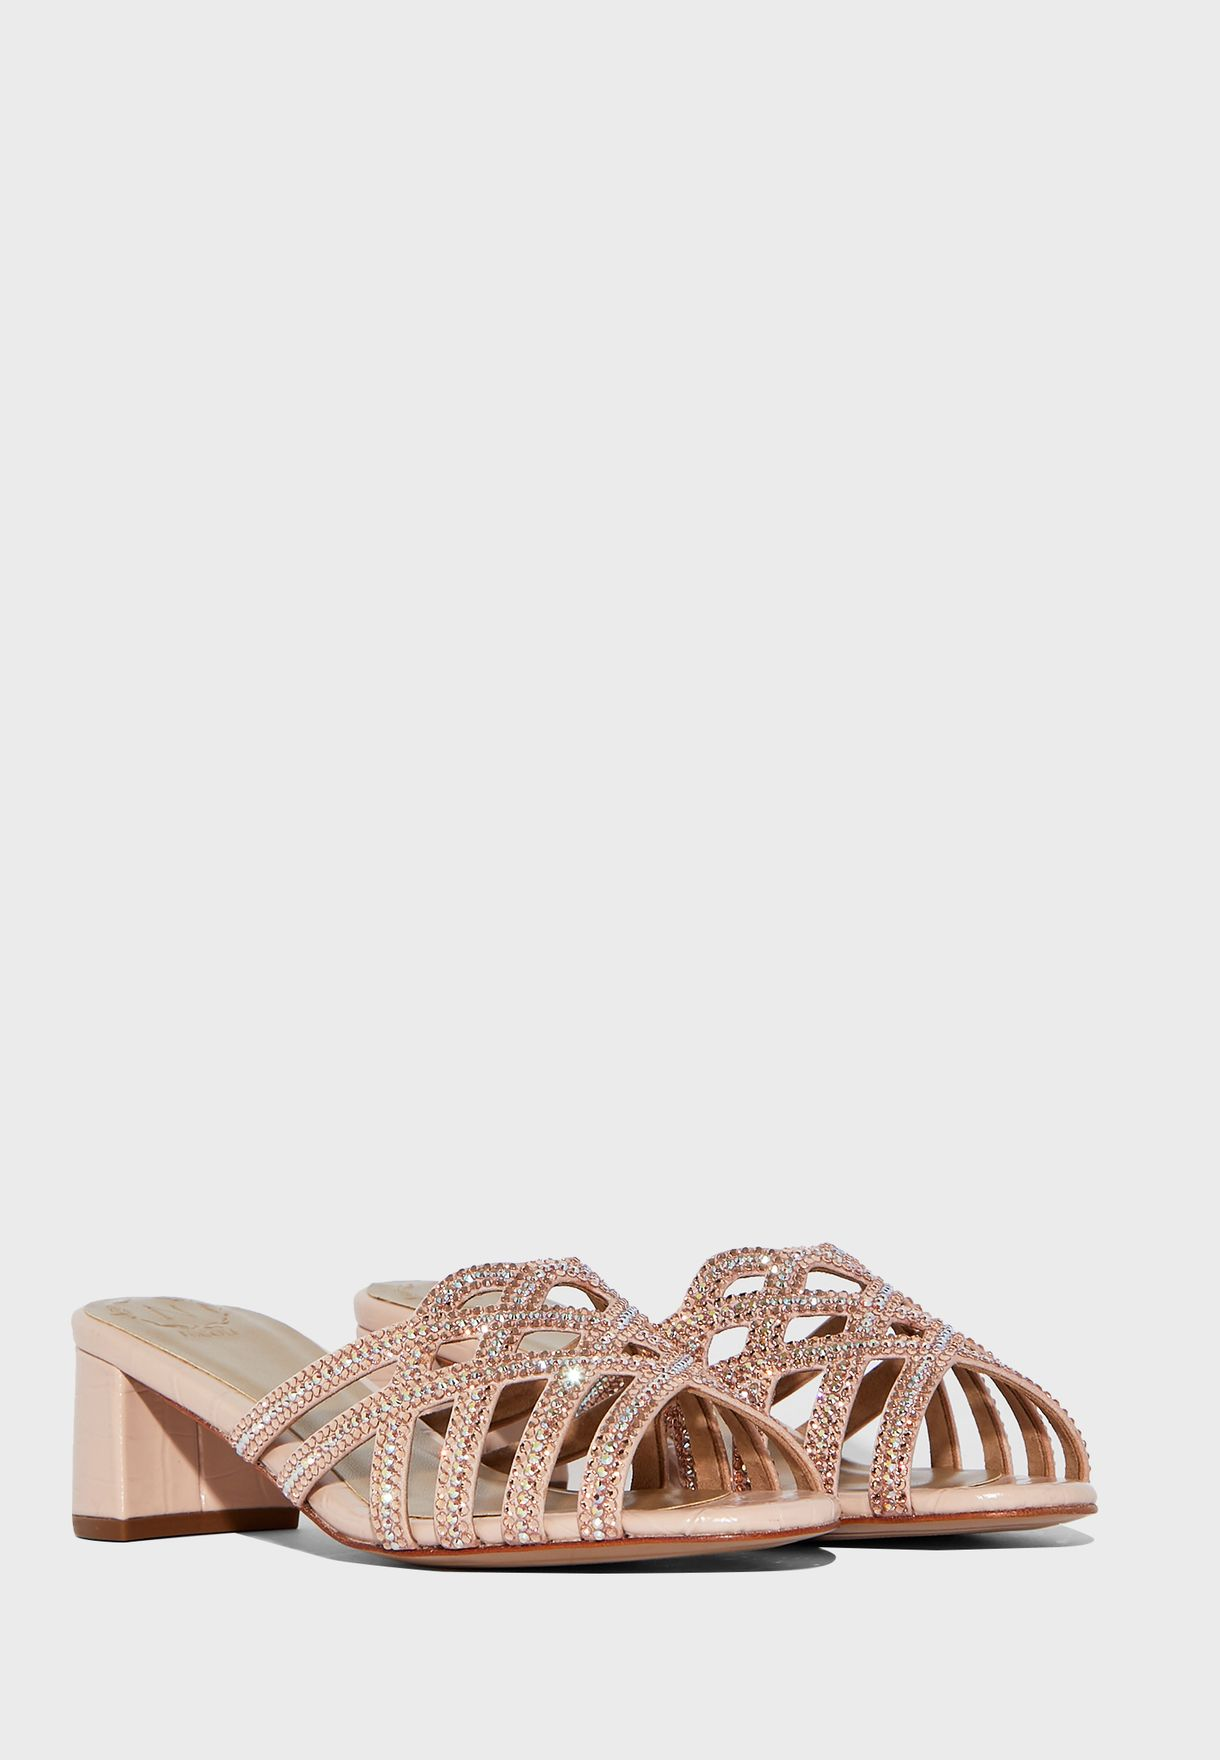 Hanrietta Mid-Heel Sandals